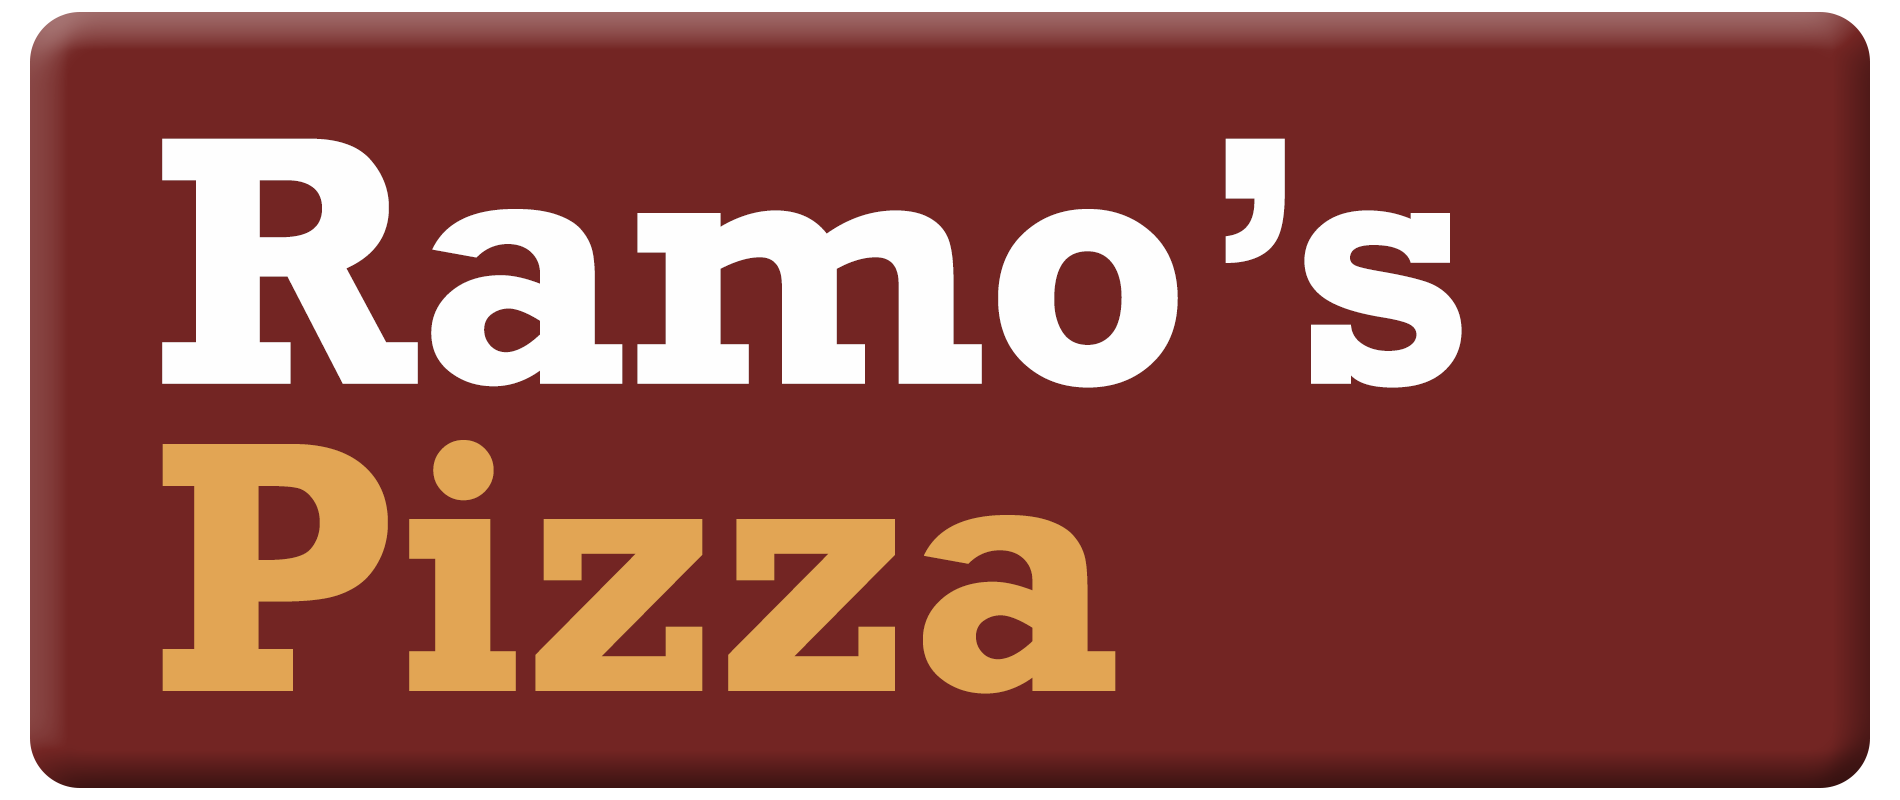 Ramos Pizza Takeaway Reviews Ratings